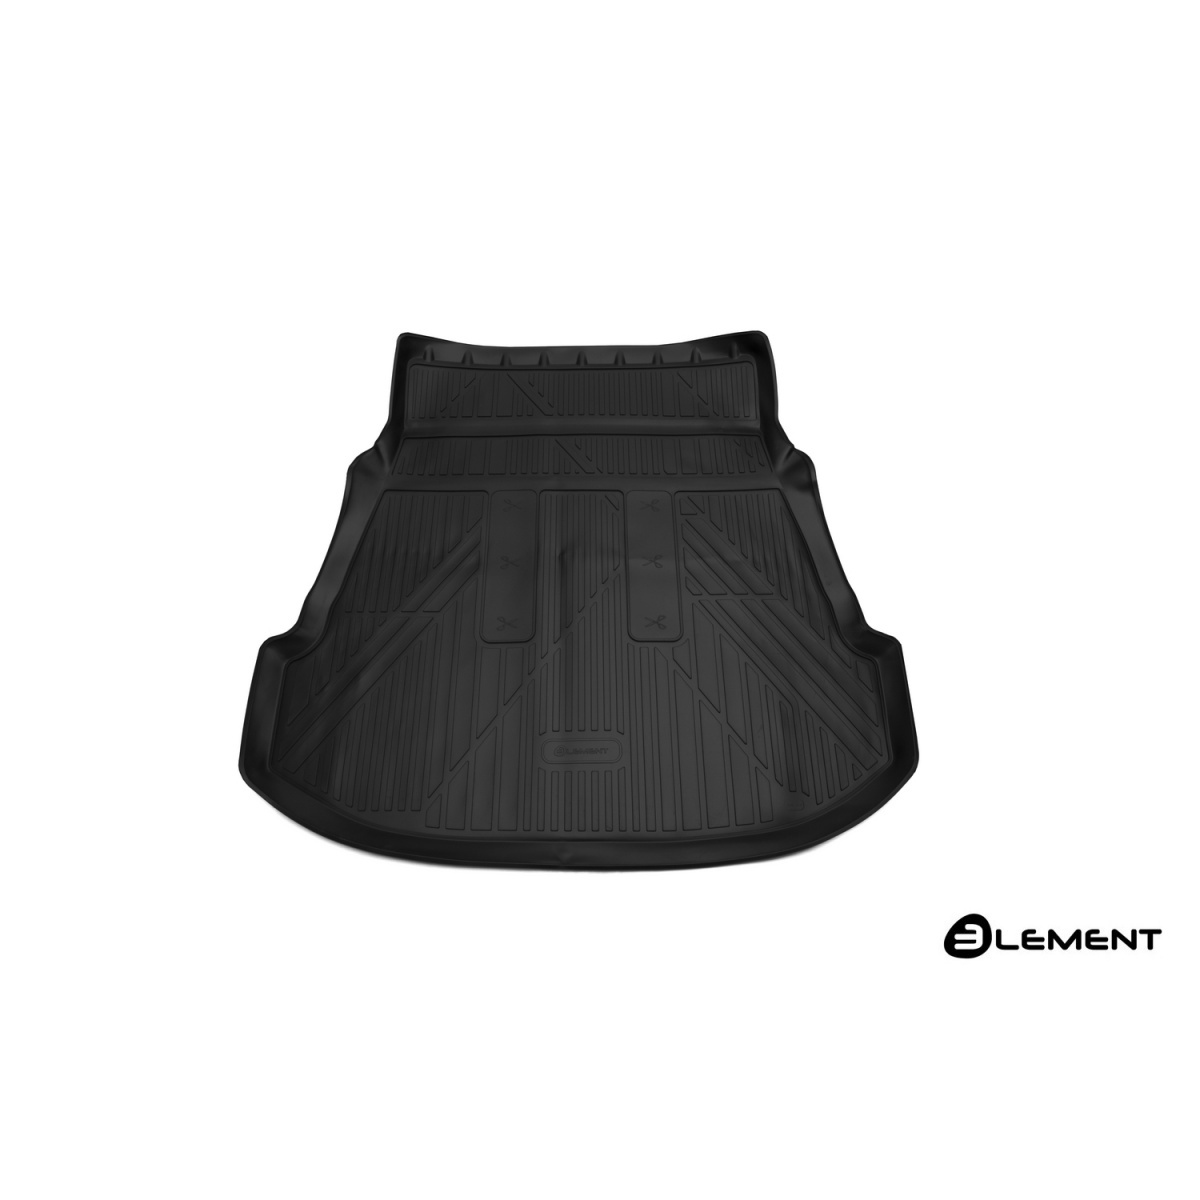 Коврик 3D в багажник For TOYOTA  Fortuner, 2017->, внед., 1 шт. (полиуретан)